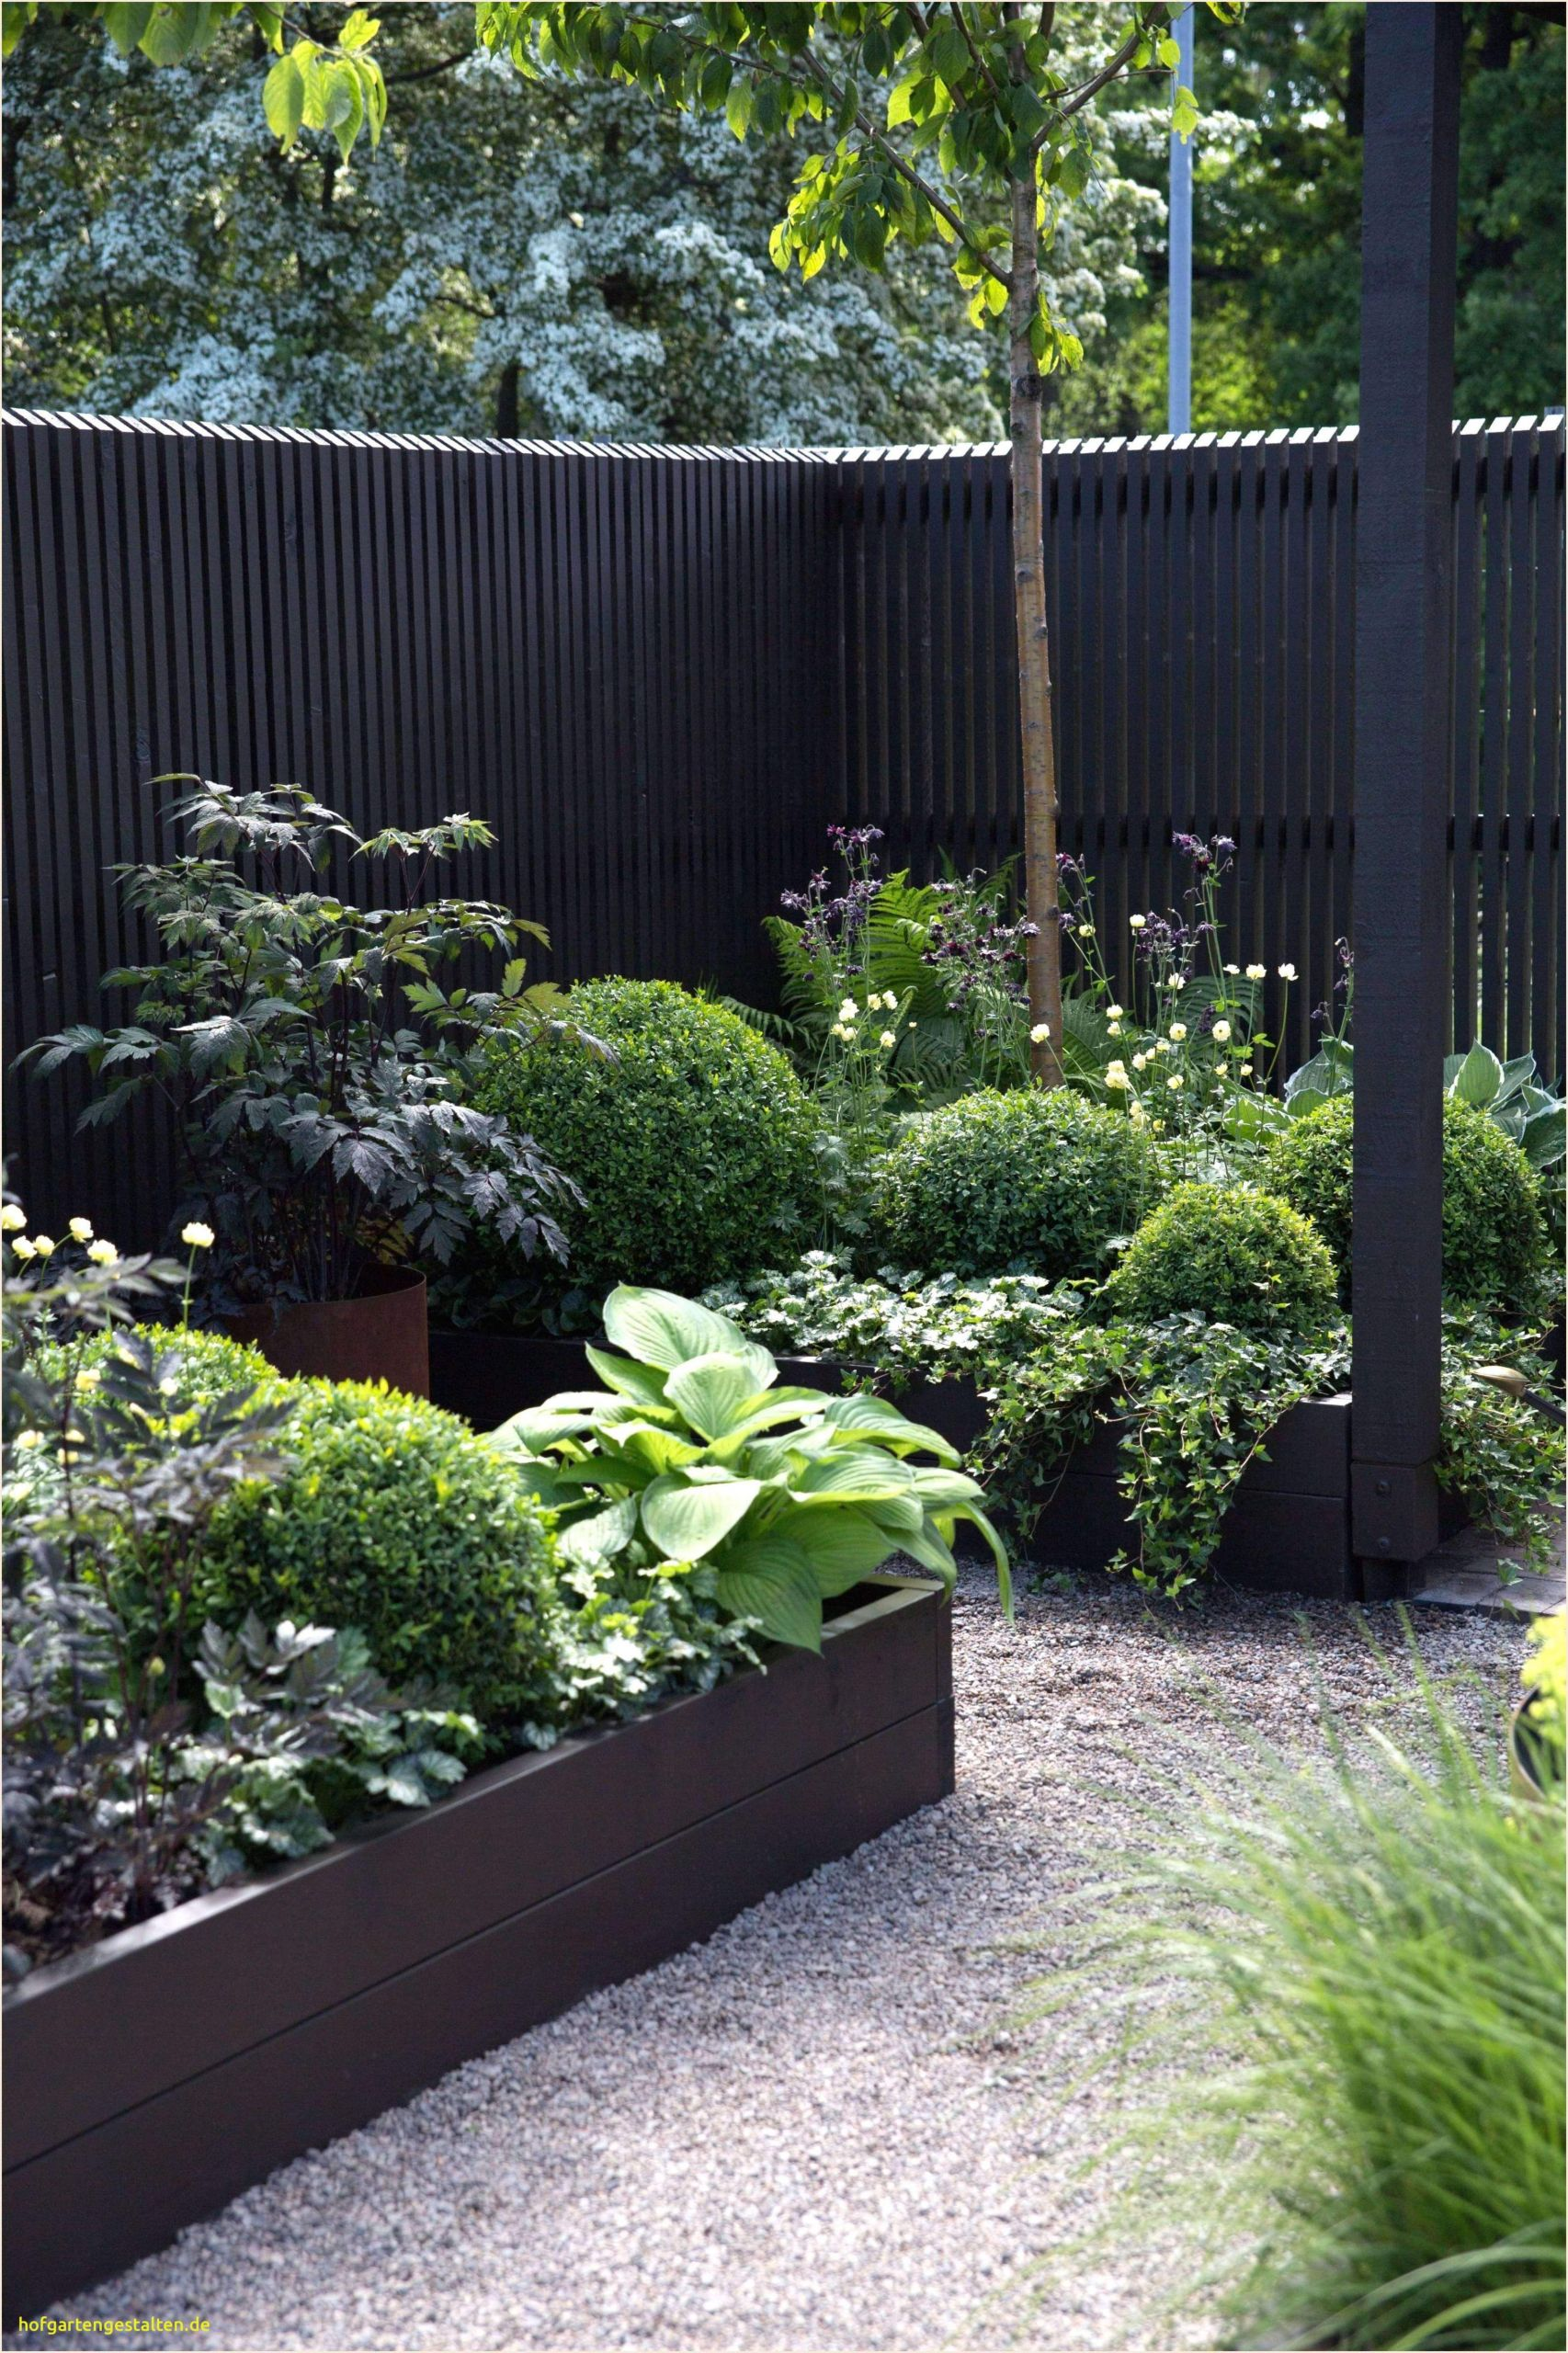 Garten Anlegen Kosten Reizend Alten Garten Neu Anlegen — Temobardz Home Blog